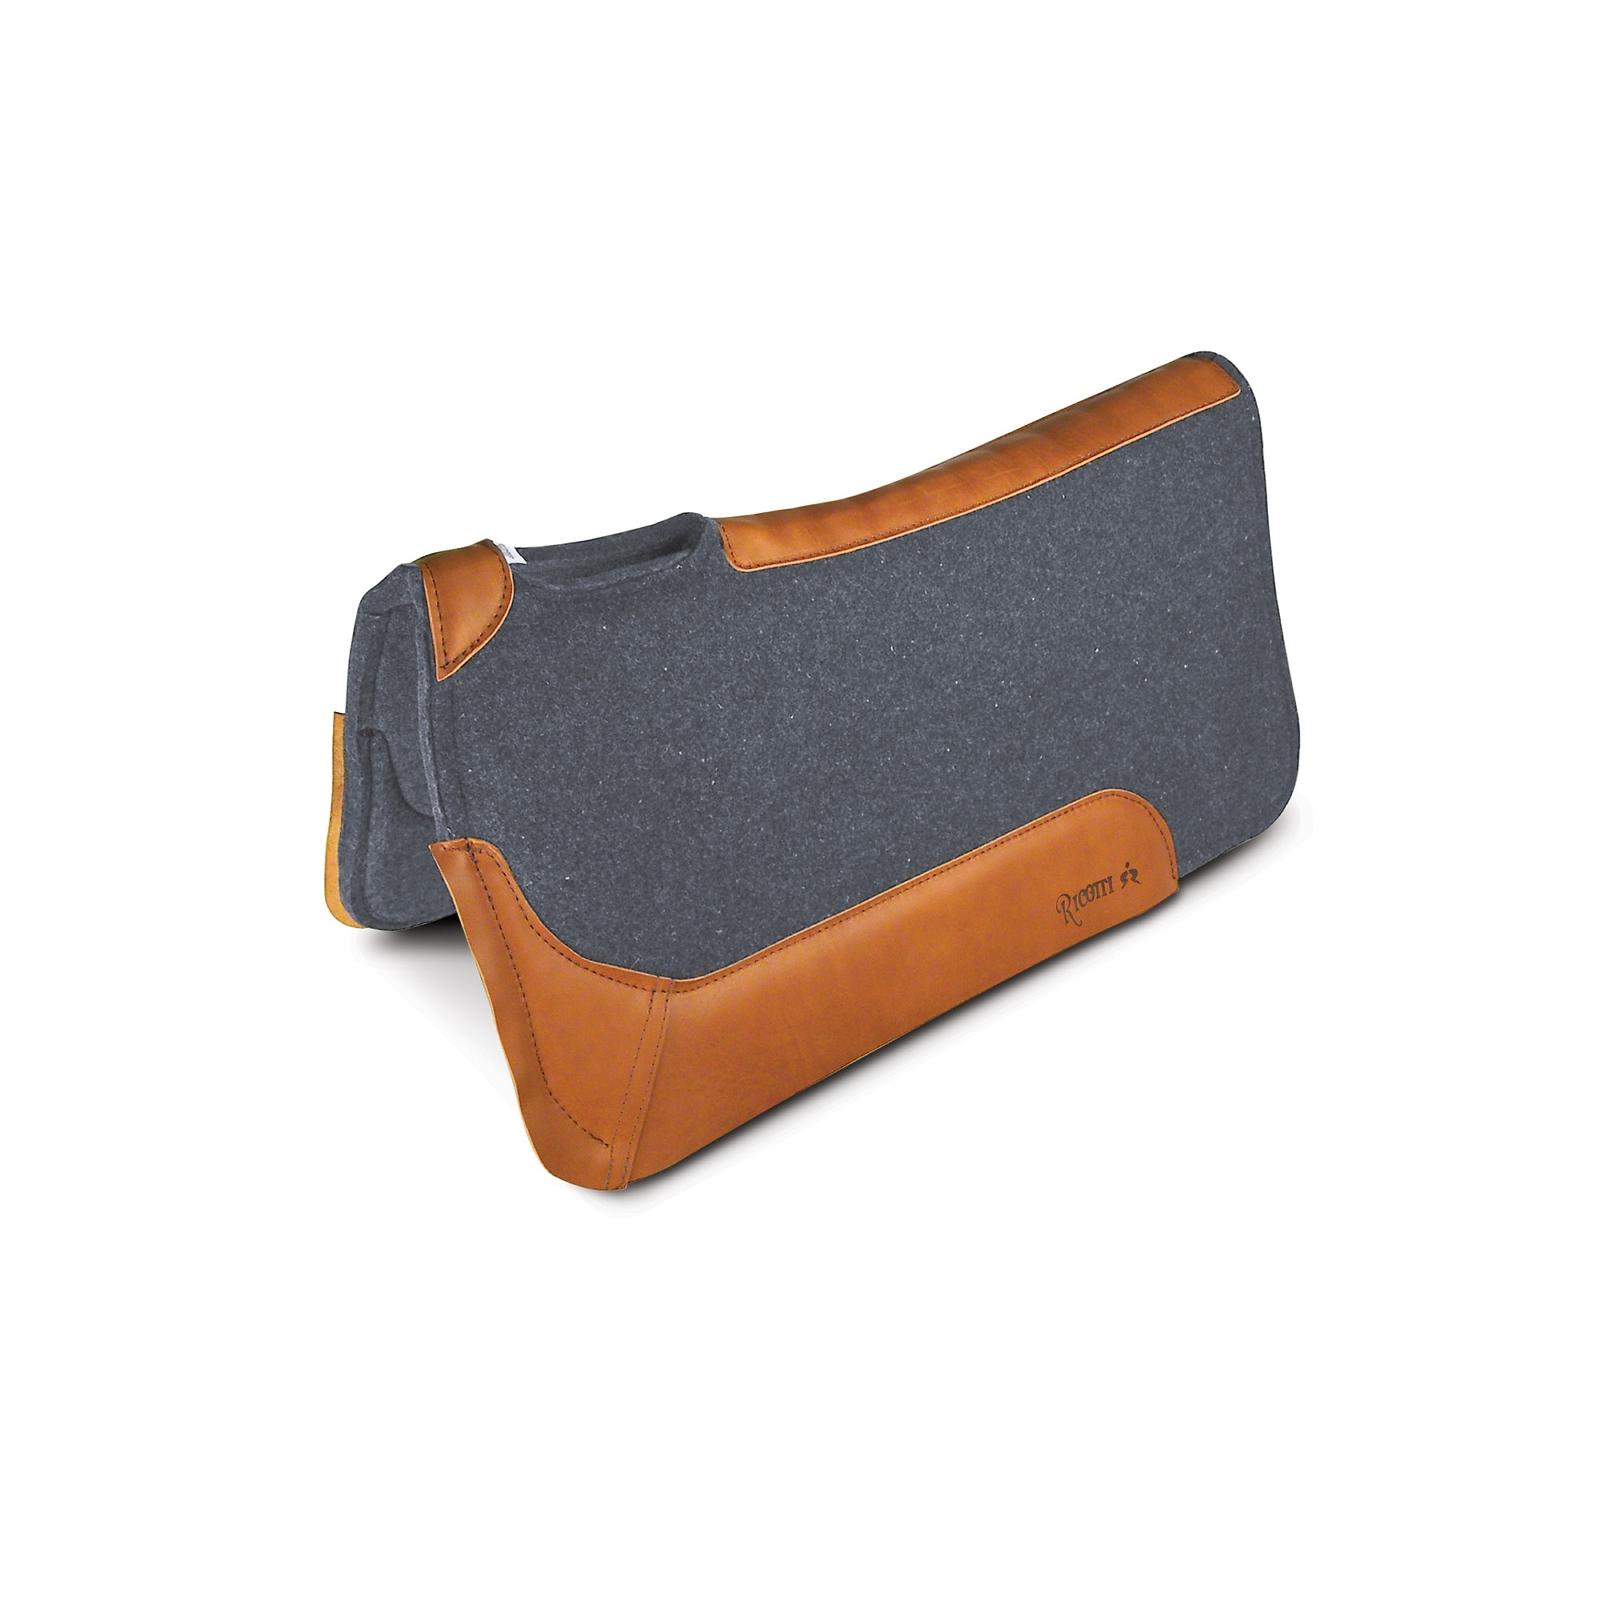 Ricotti Saddle Company Felt Standard Wool Blend Pad